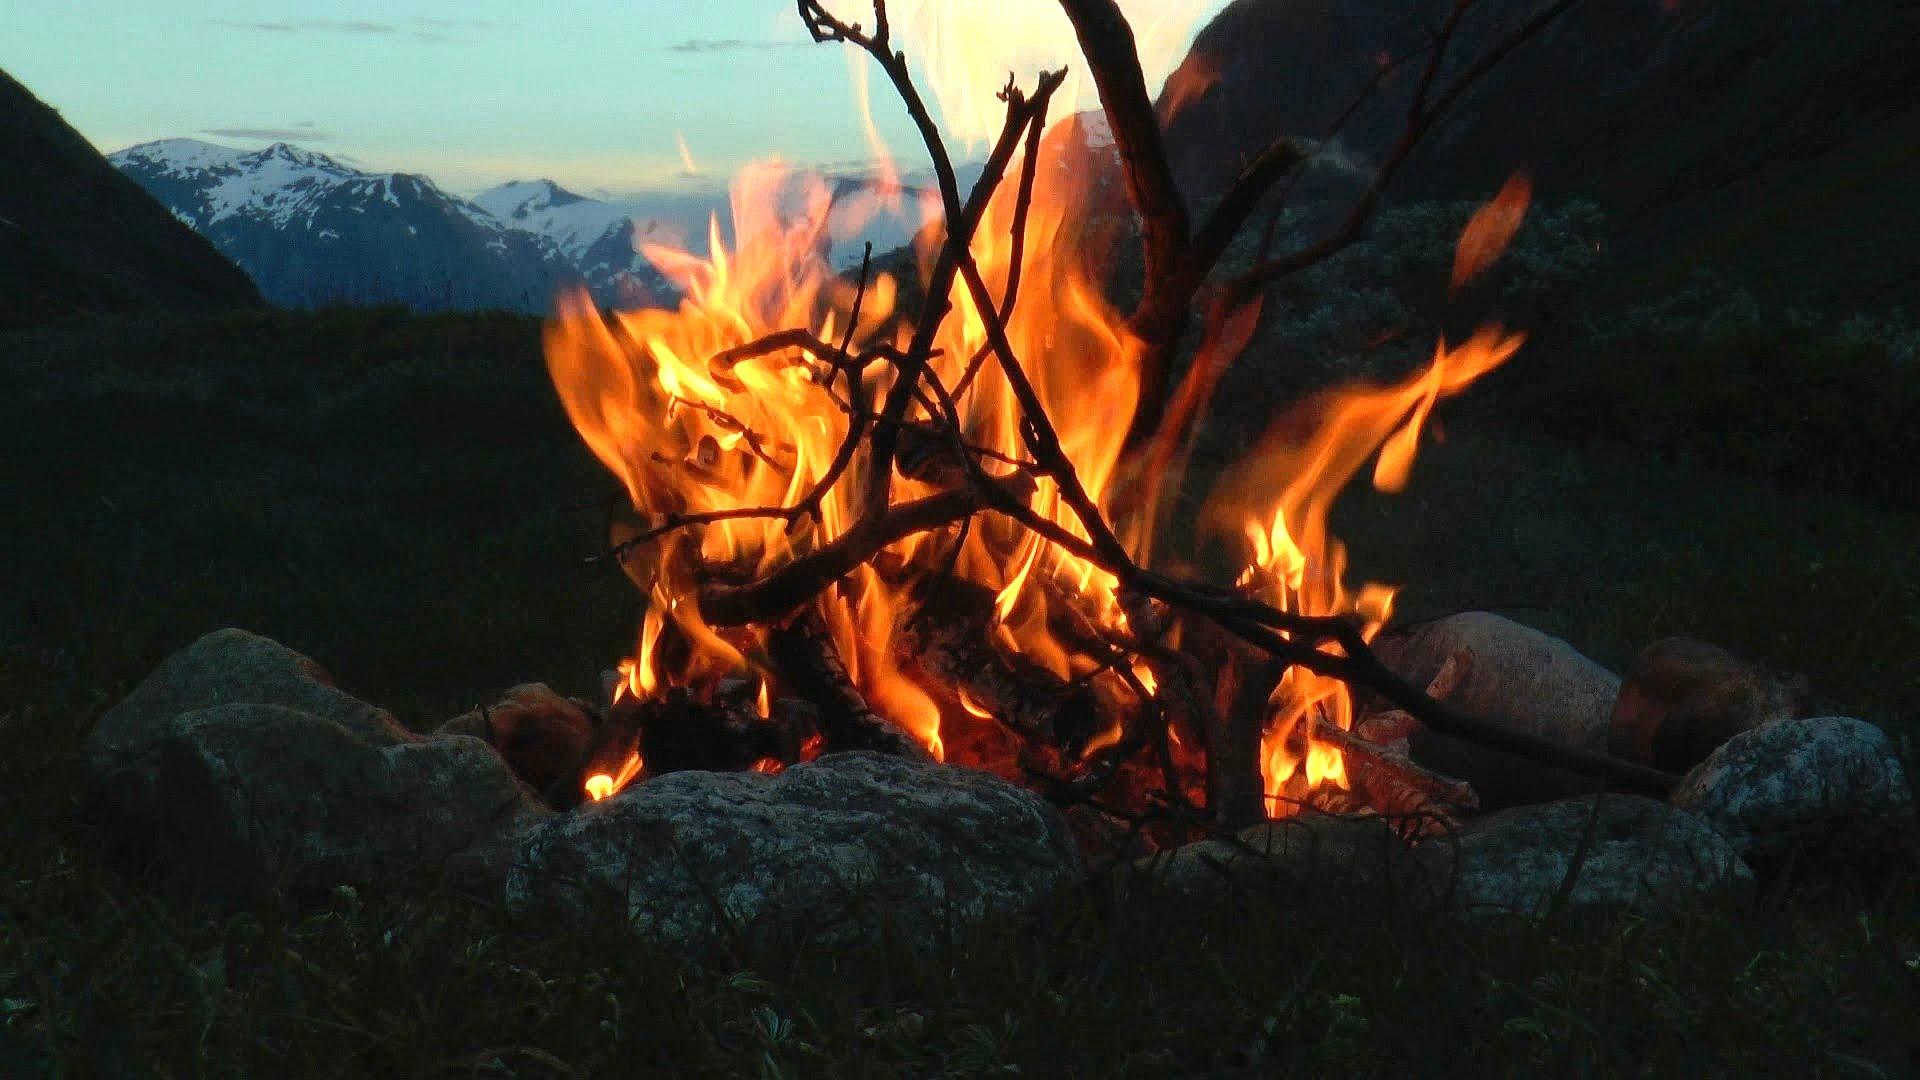 Drawn camp fire fireplace (HD) Campfire Mountain River Relaxing